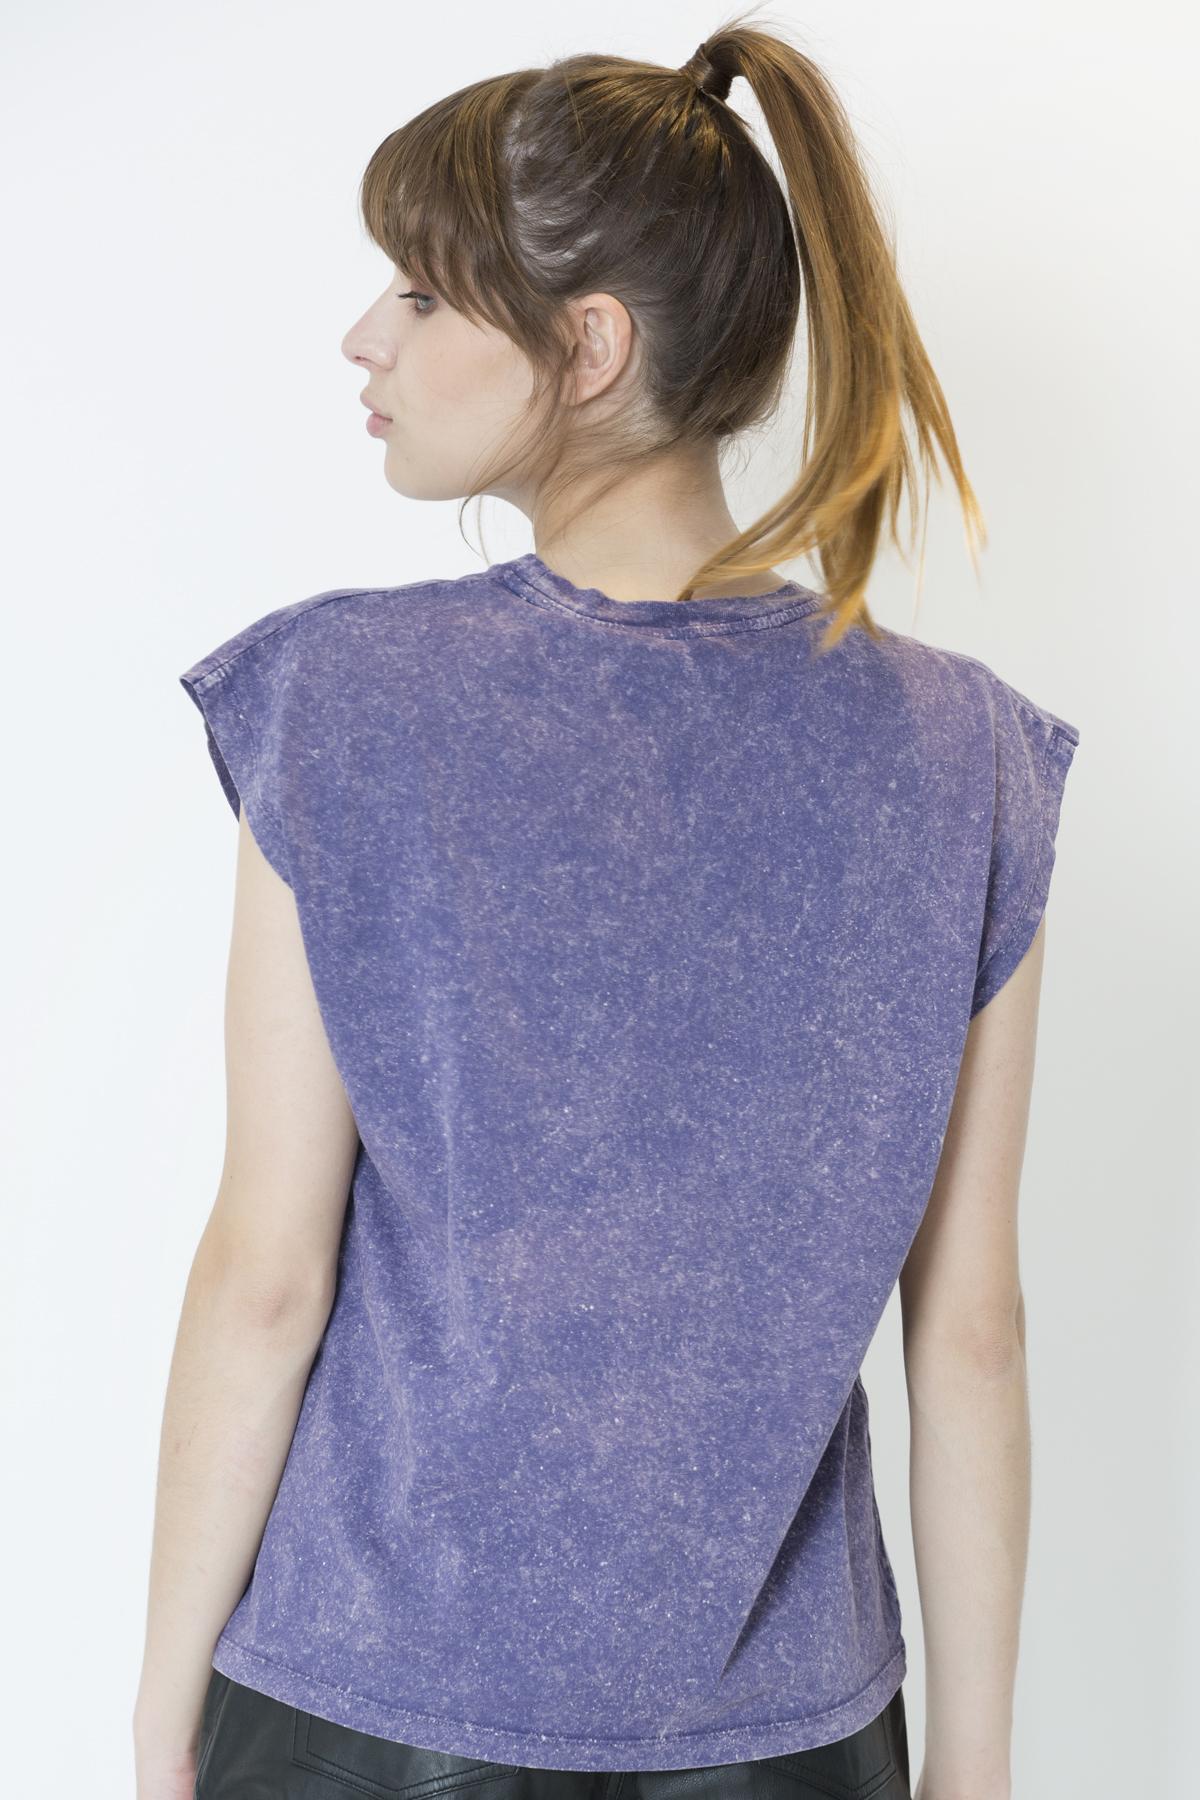 albina-tank-top-purple-iro-matchboxathens